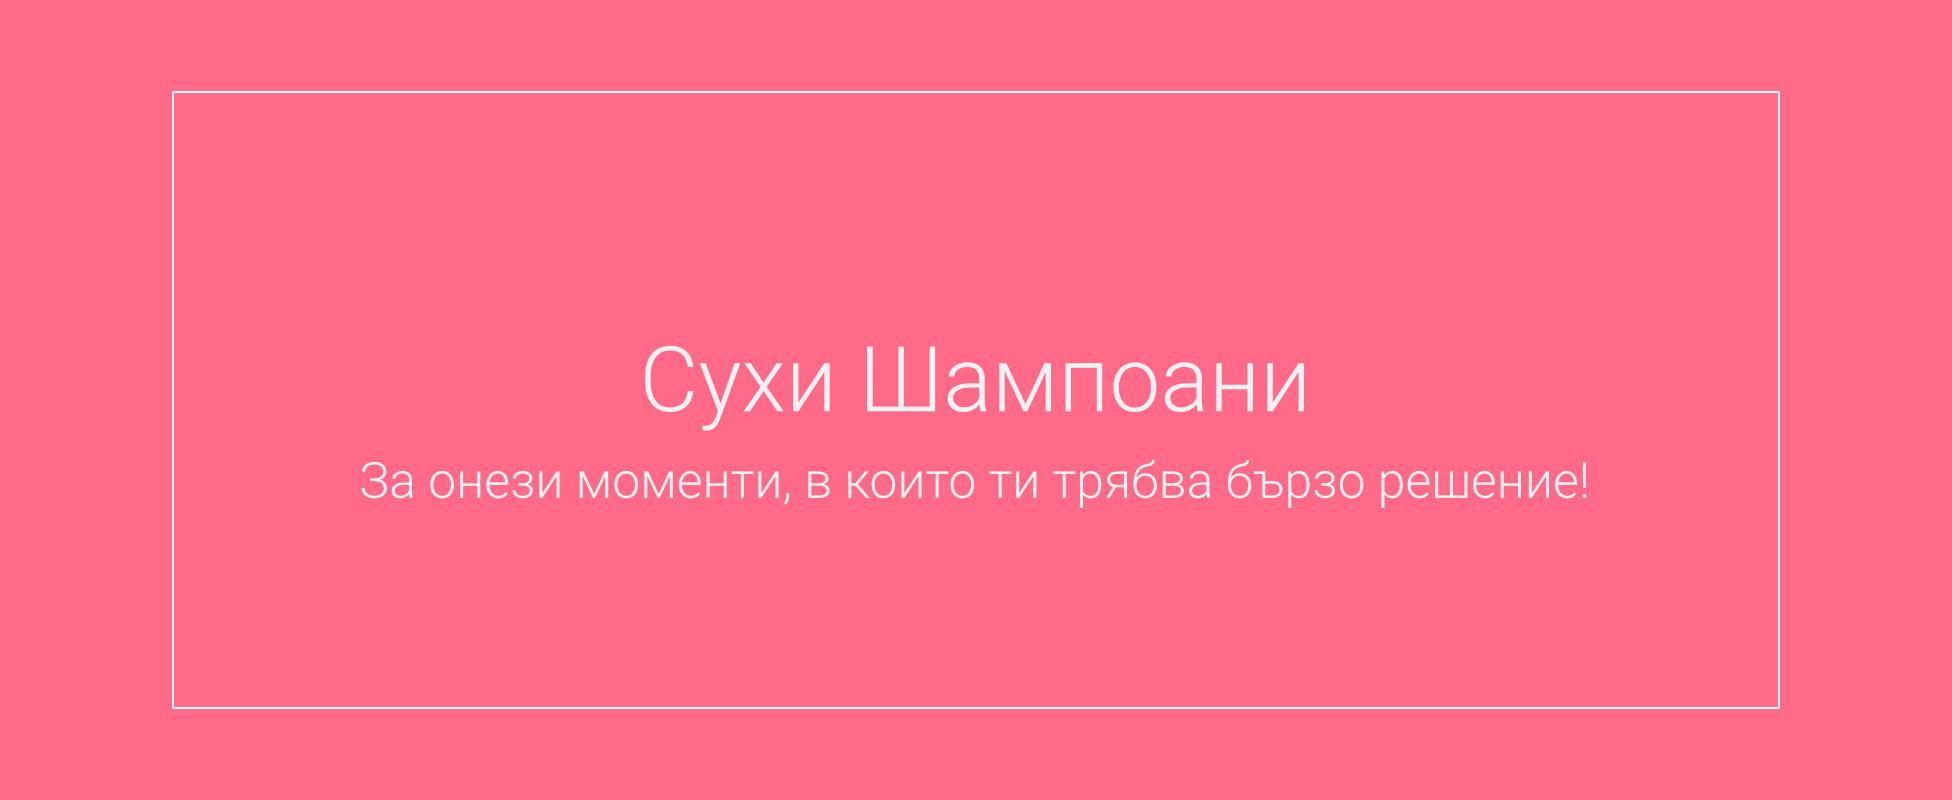 suh-shampoan